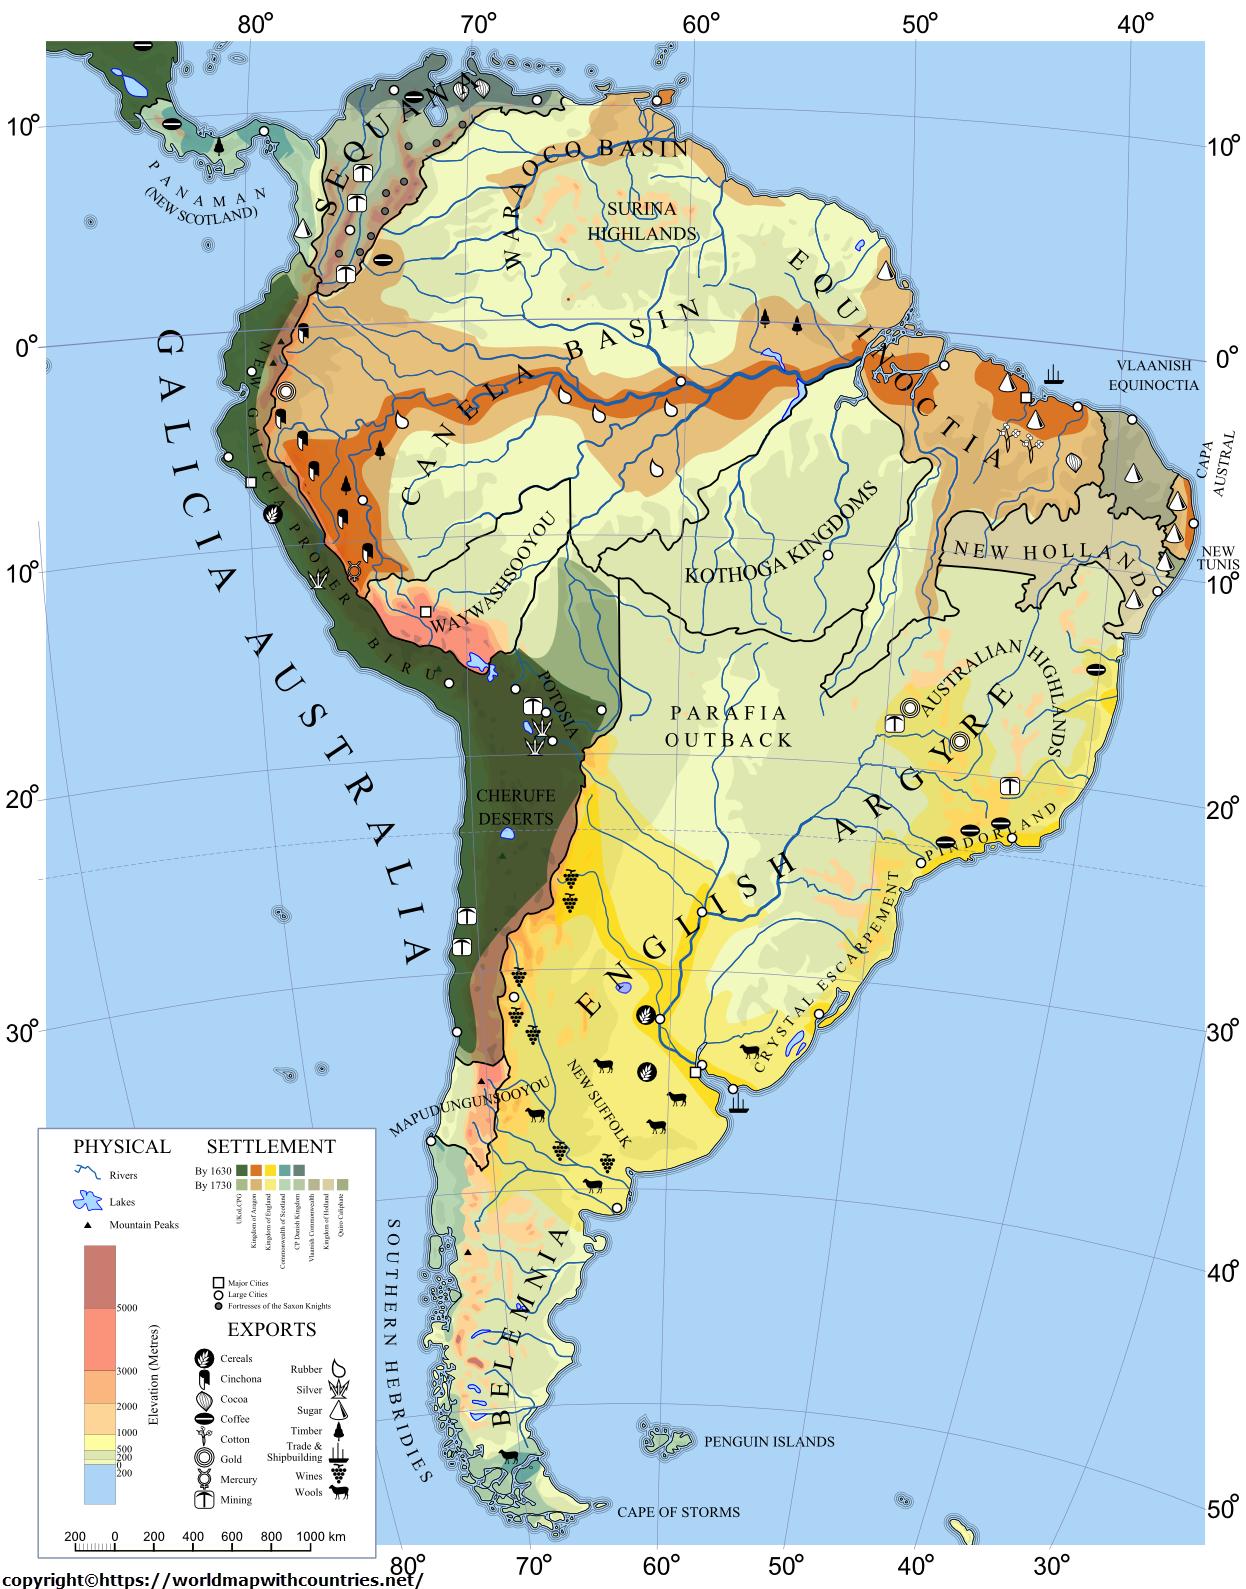 South America 7